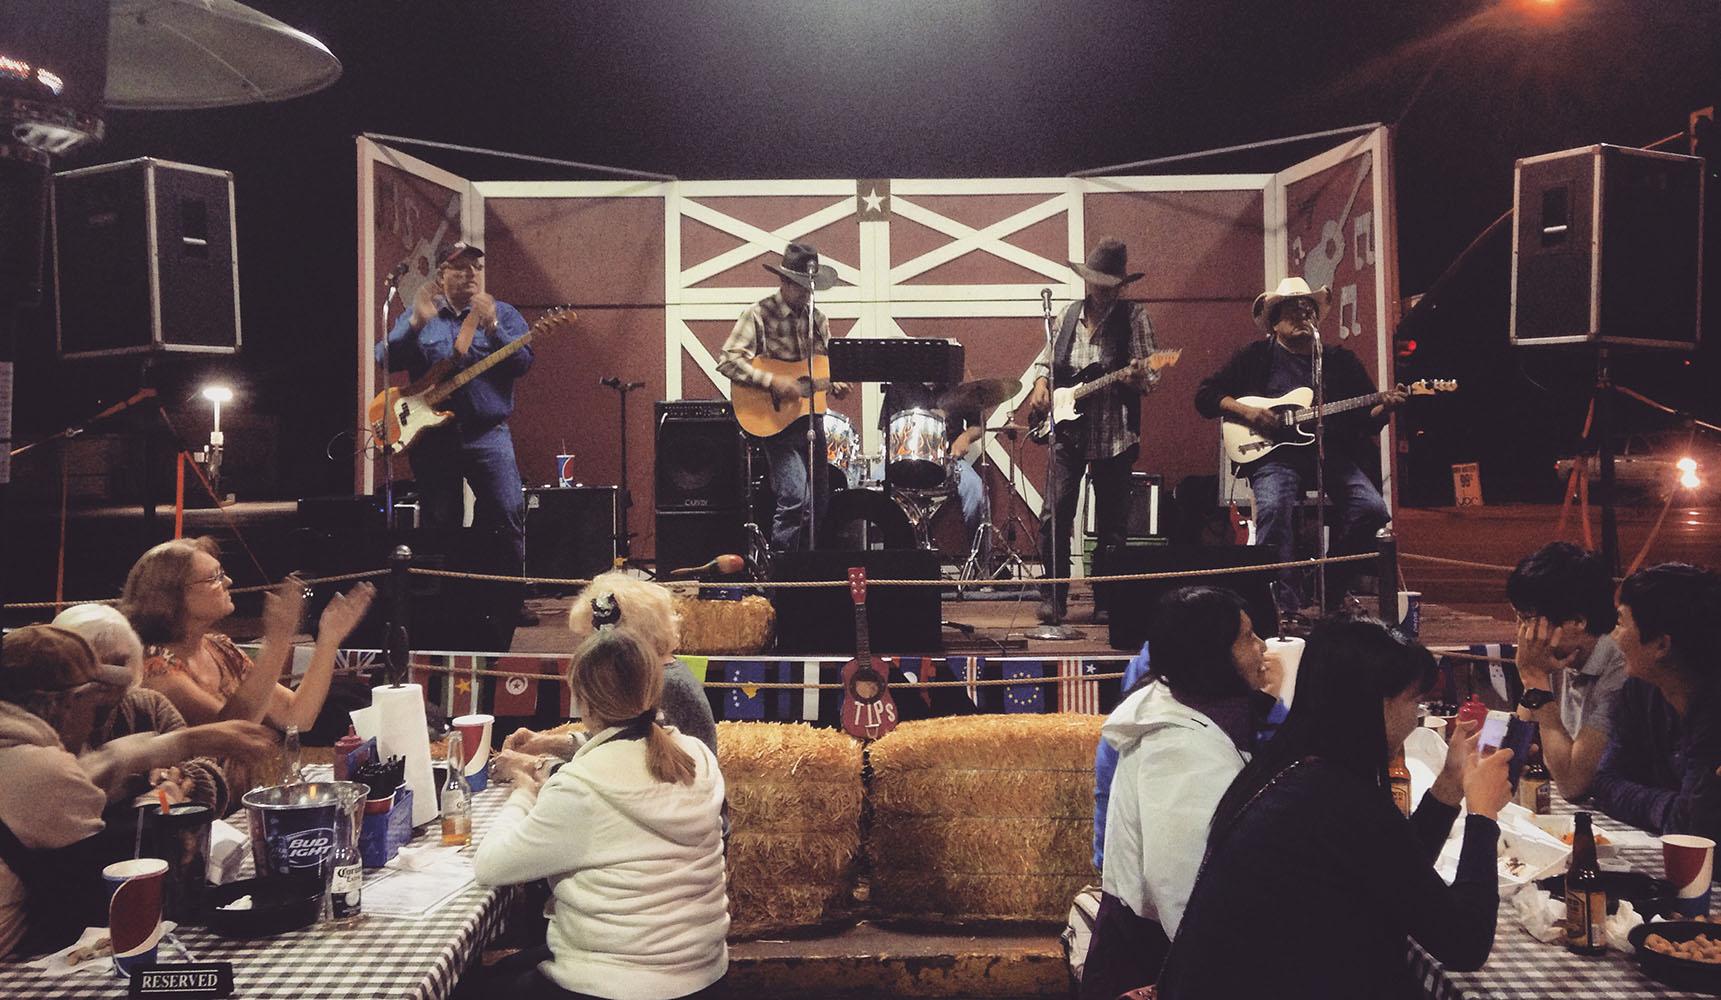 Big John's Texas BBQ USA Arizona Page Lake Powell concert show country music cowboy